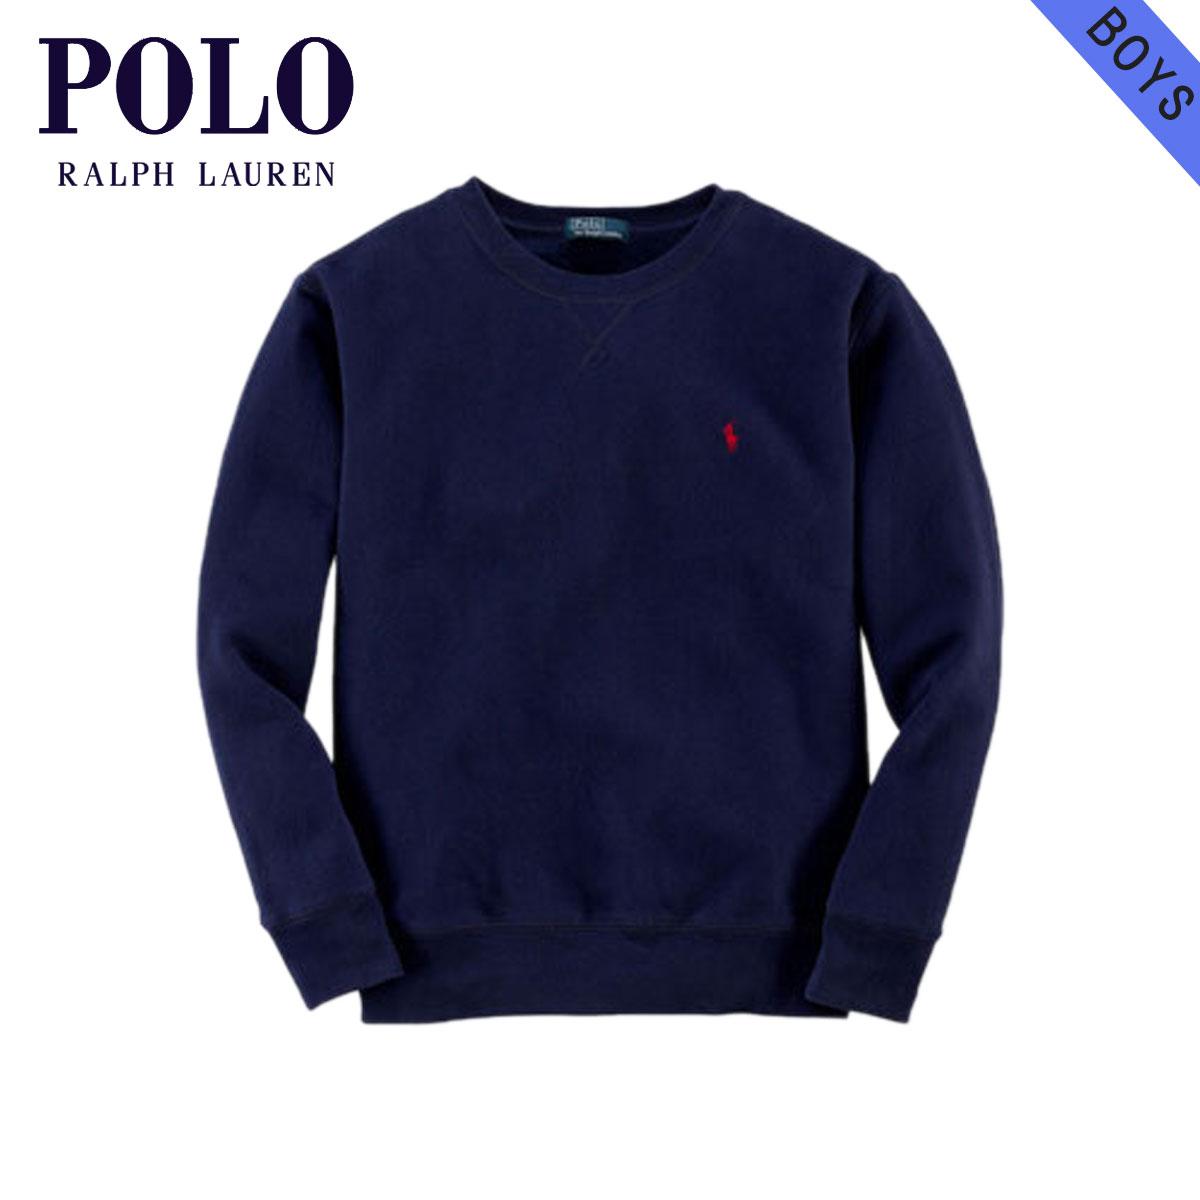 8f0dc8774 Poloralflorenkids POLO RALPH LAUREN CHILDREN genuine kids clothing boys  sweatshirts Long Sleeve Fleece Crewneck  21589196 NAVY 10P22Jul14